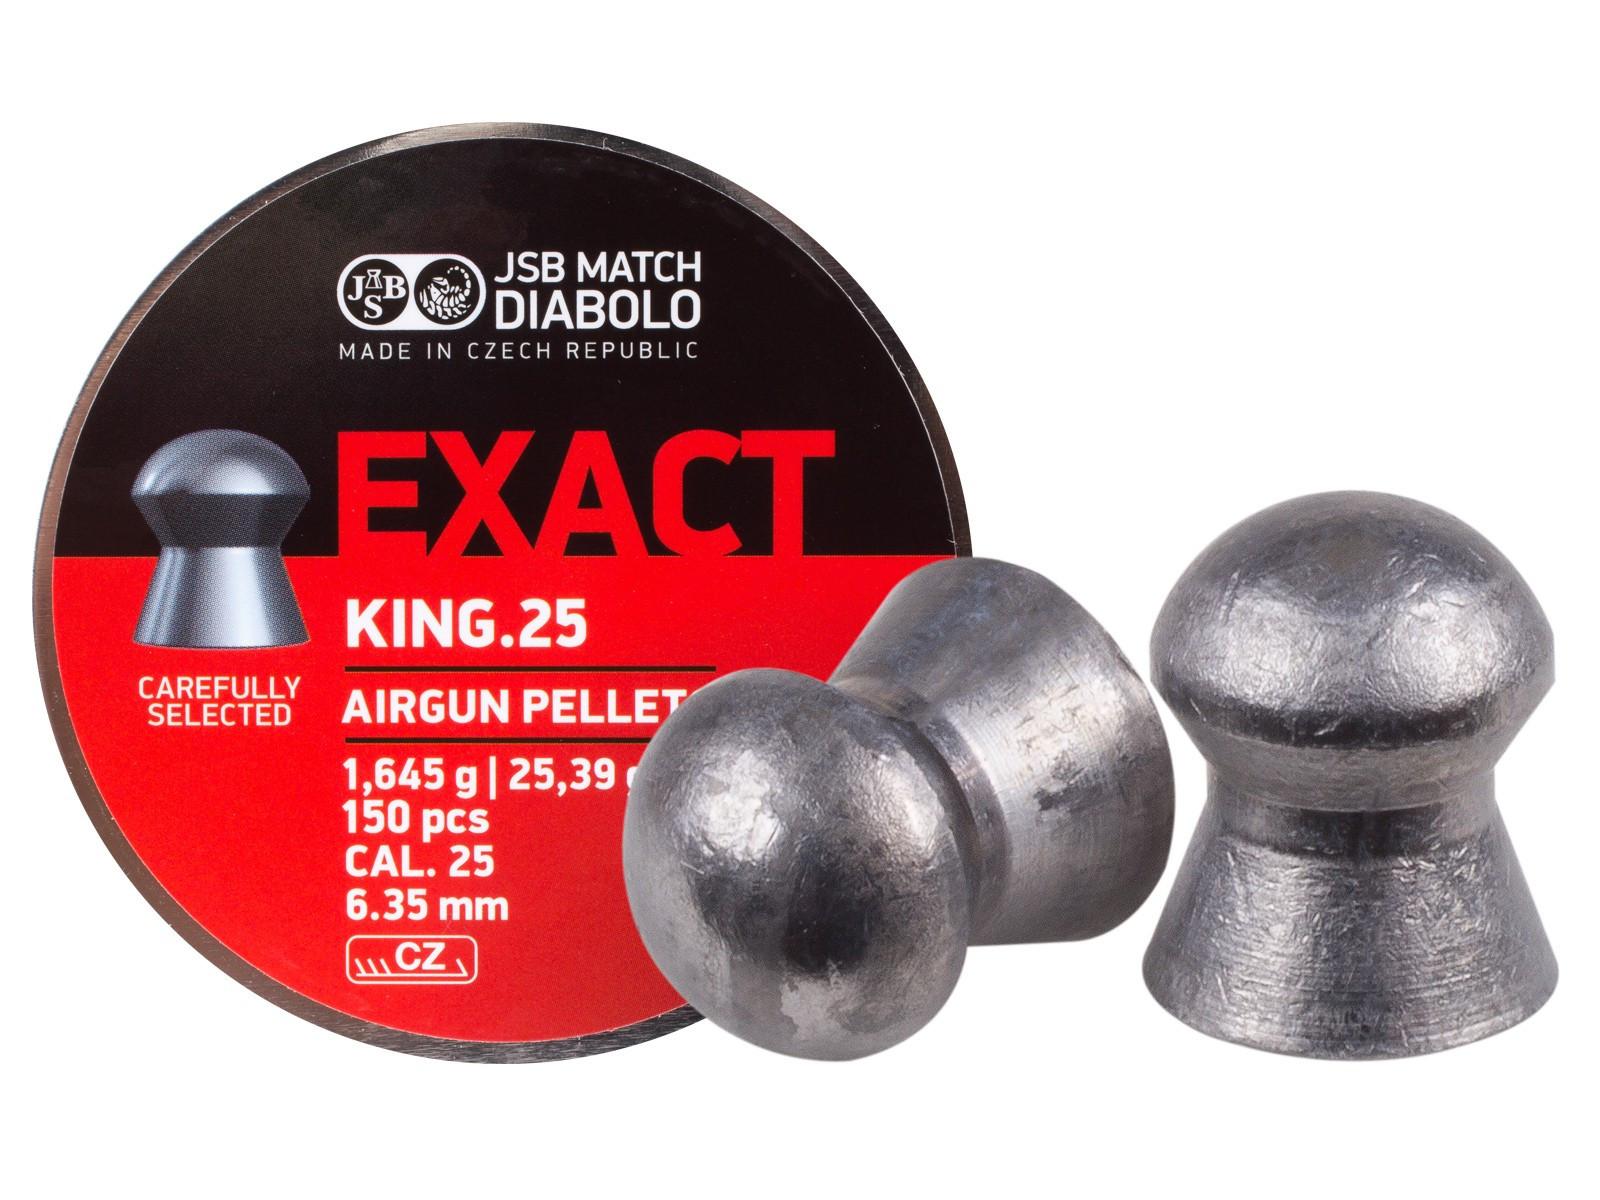 JSB Diabolo Exact King .25 Cal, 25.39 gr - 150 ct